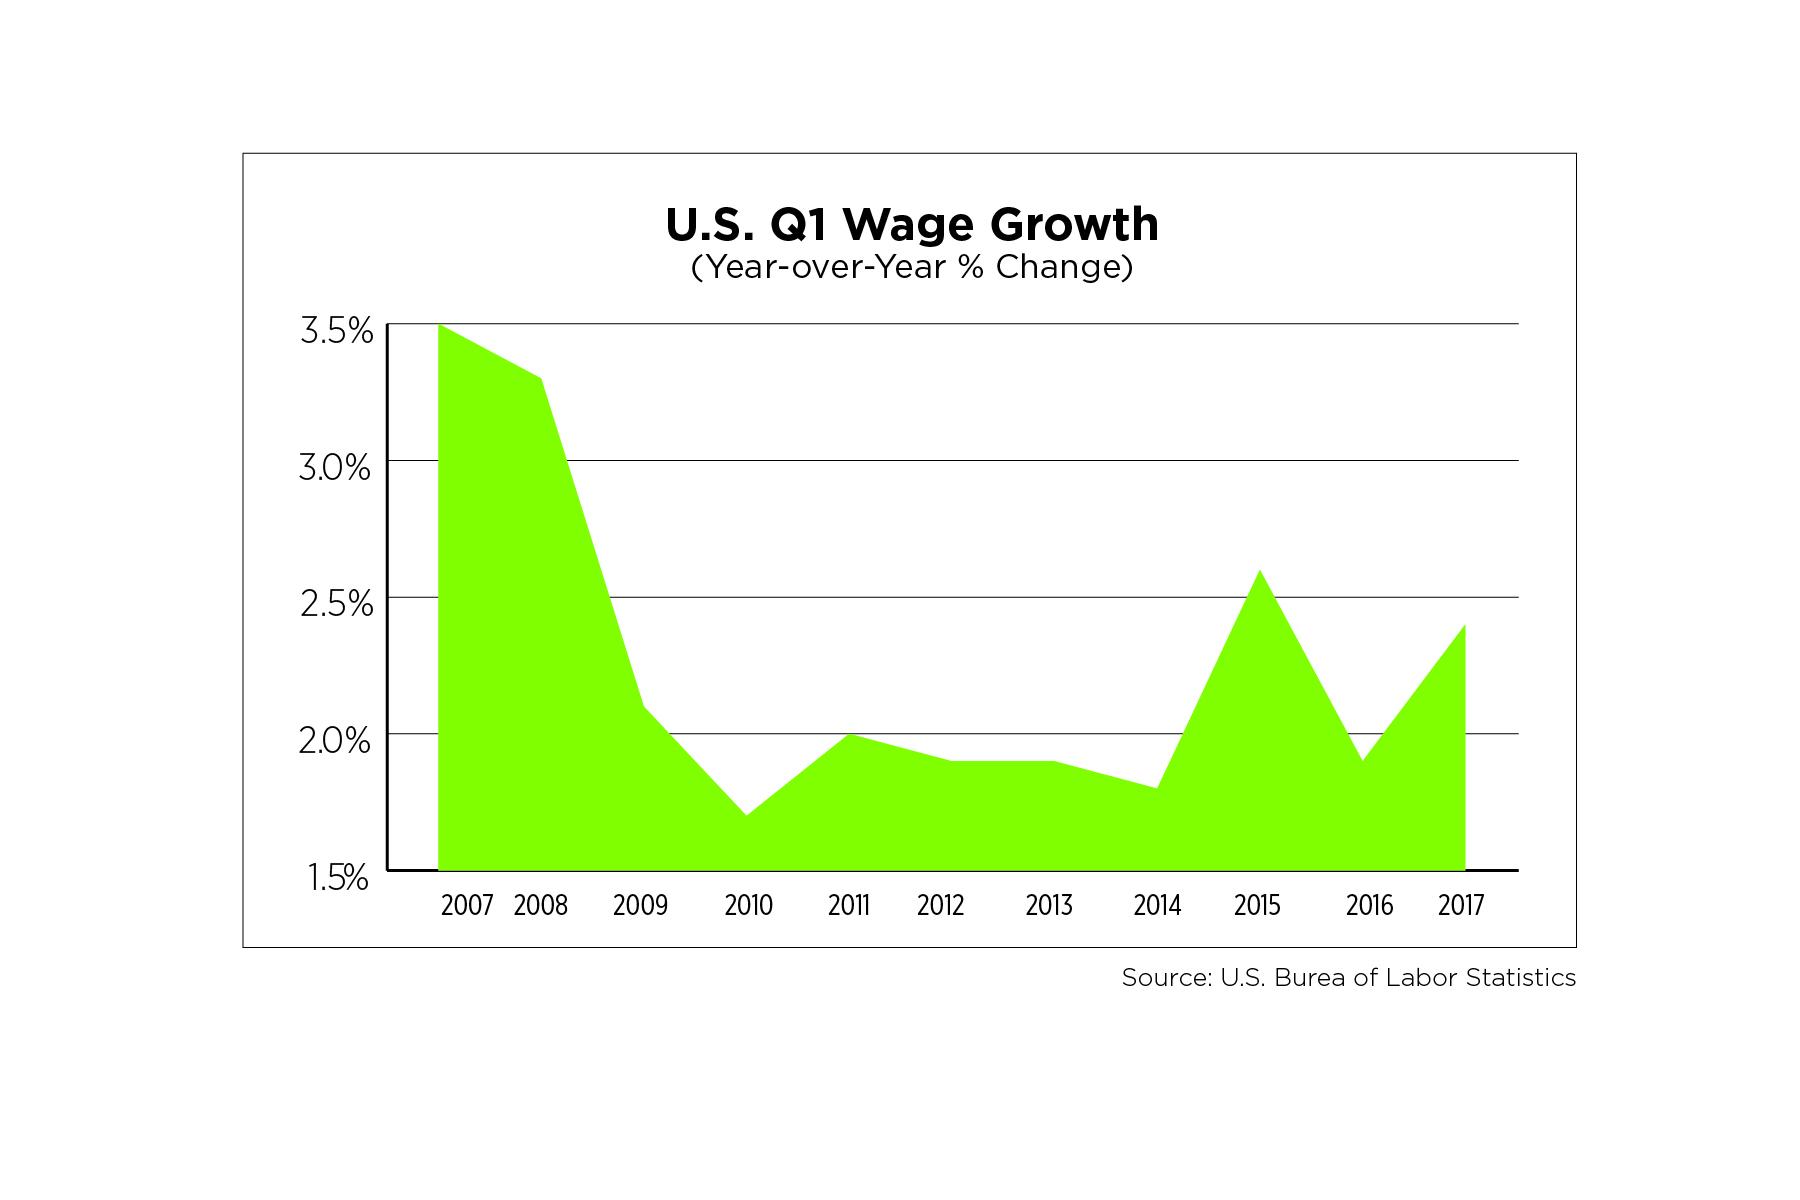 US Q1 Wage Growth